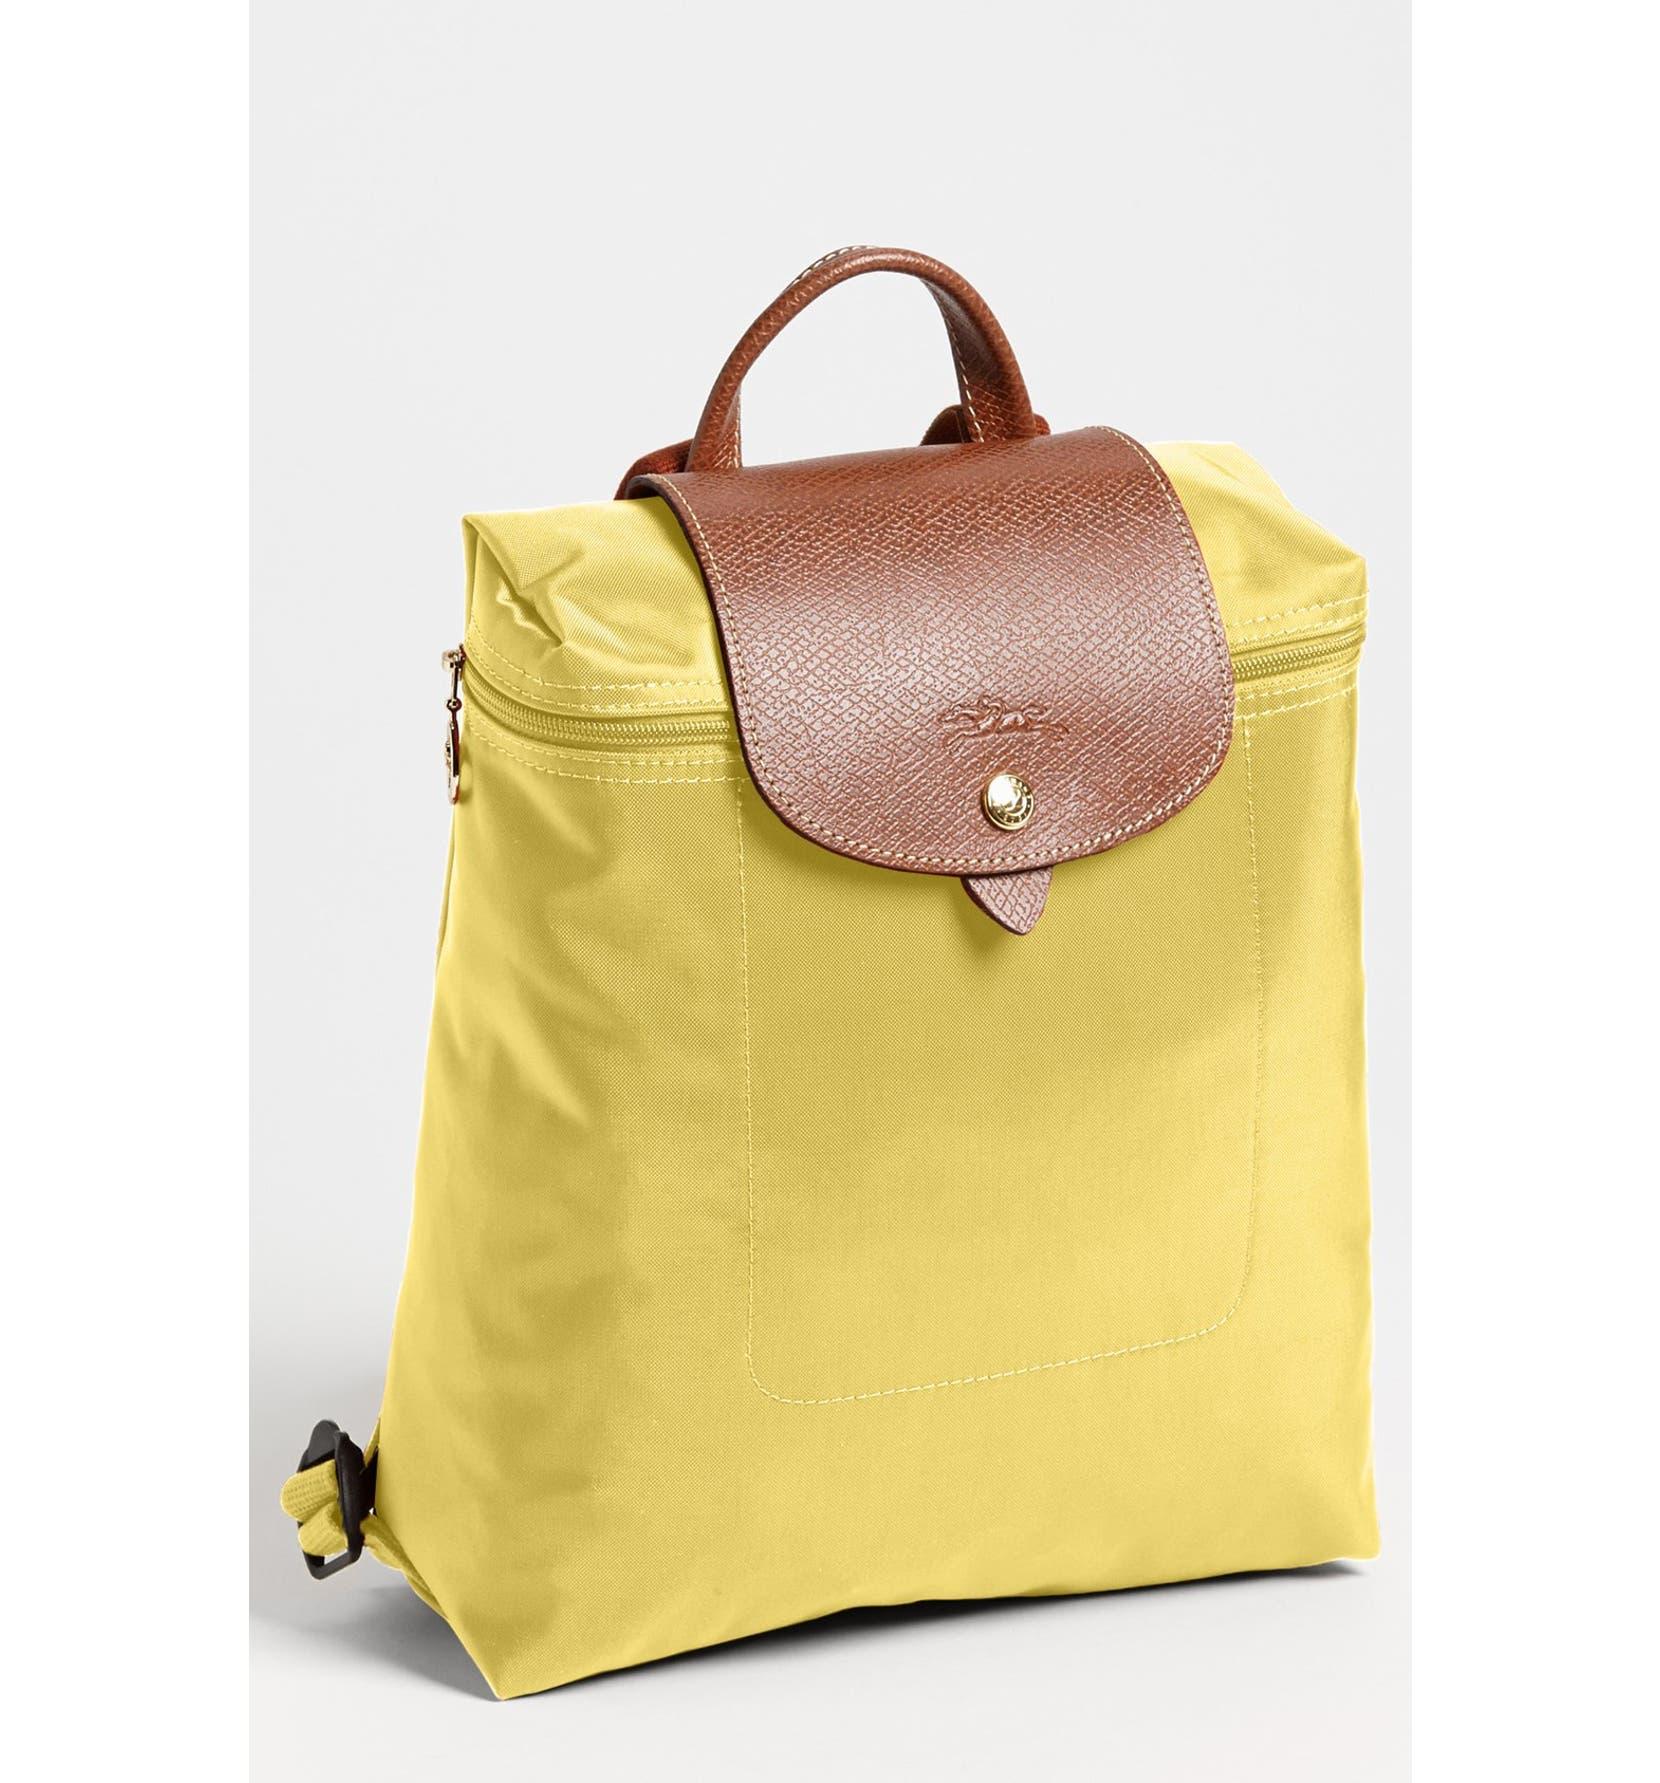 a9091e1cd8b2 Longchamp Backpack Mustard Cross Body Bag - Tradesy